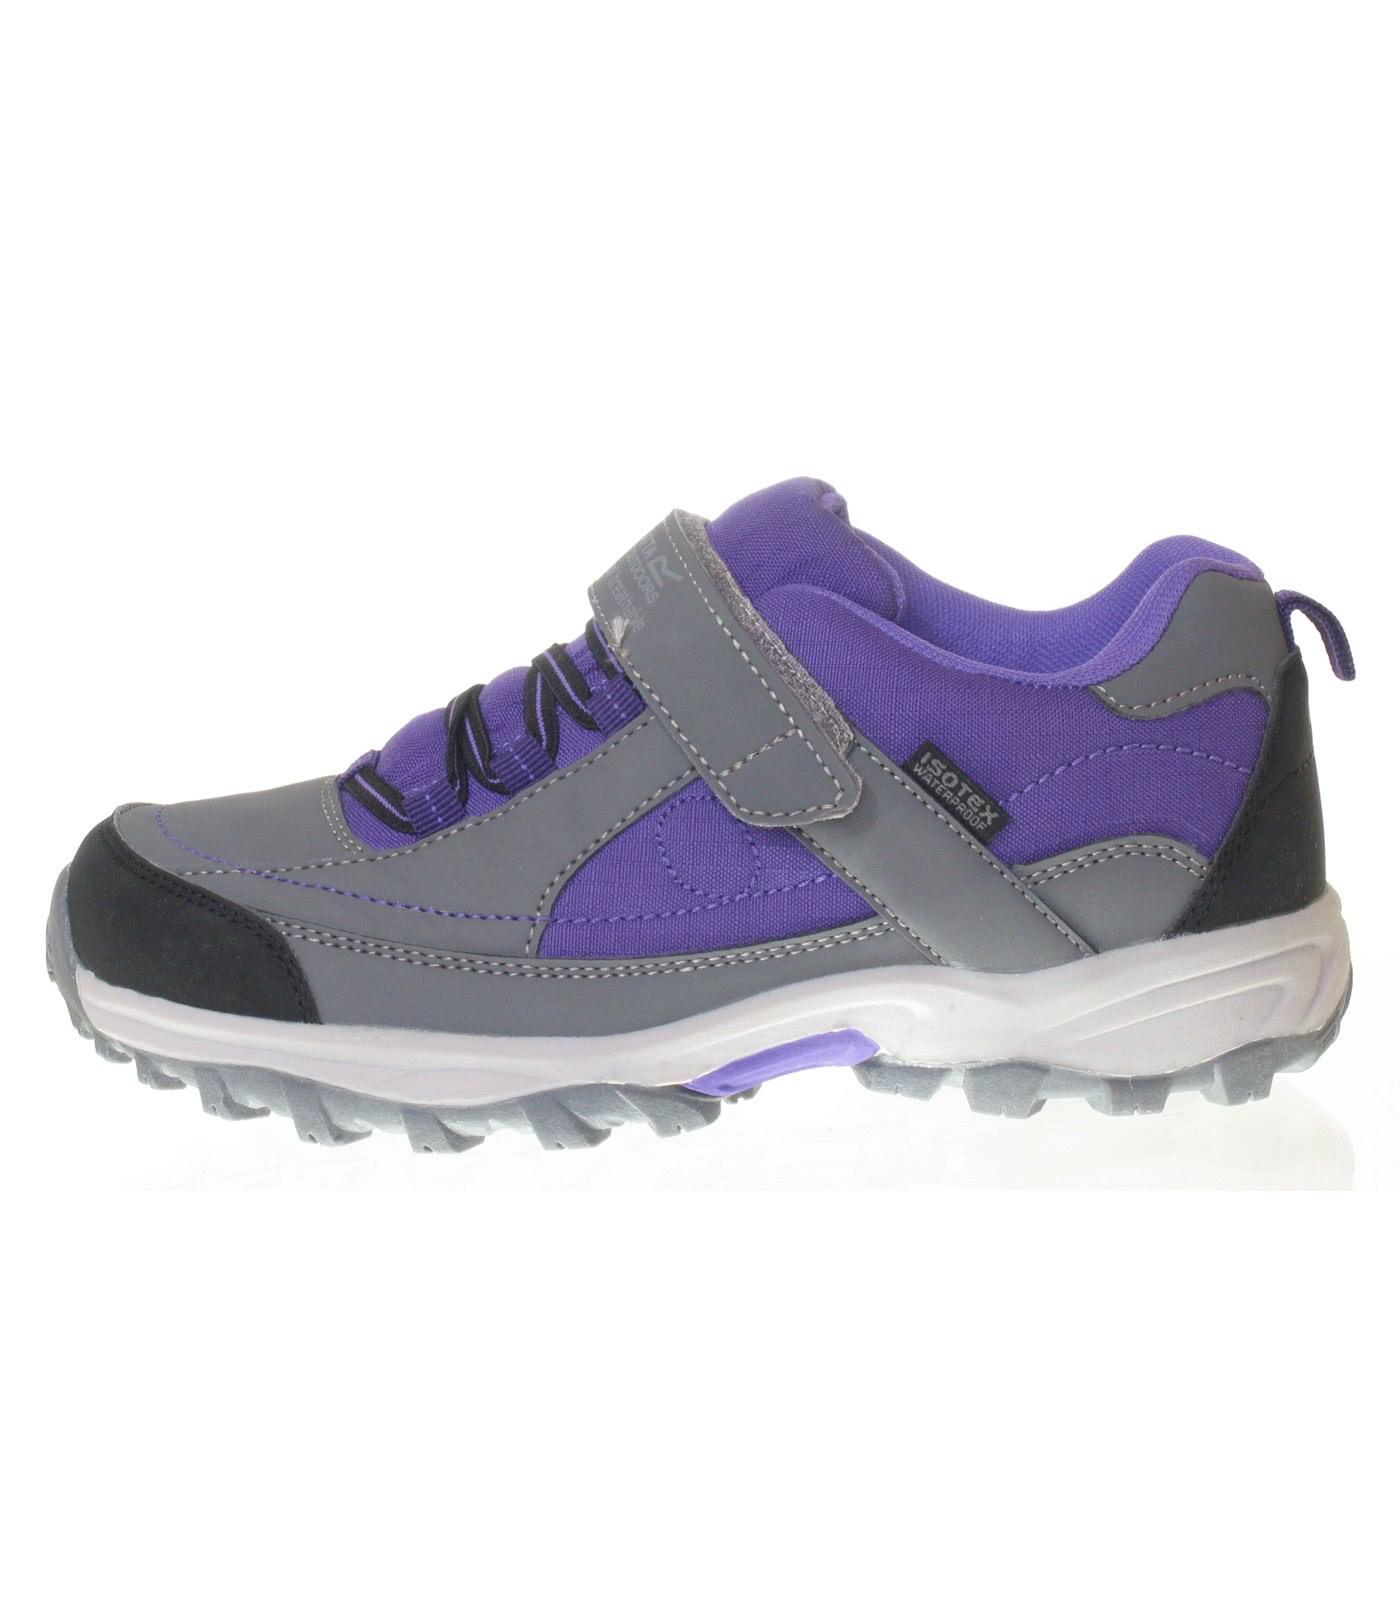 37c35babd Термо ботинки Regatta Trailspace Lw Купить в аутлете 3akcii